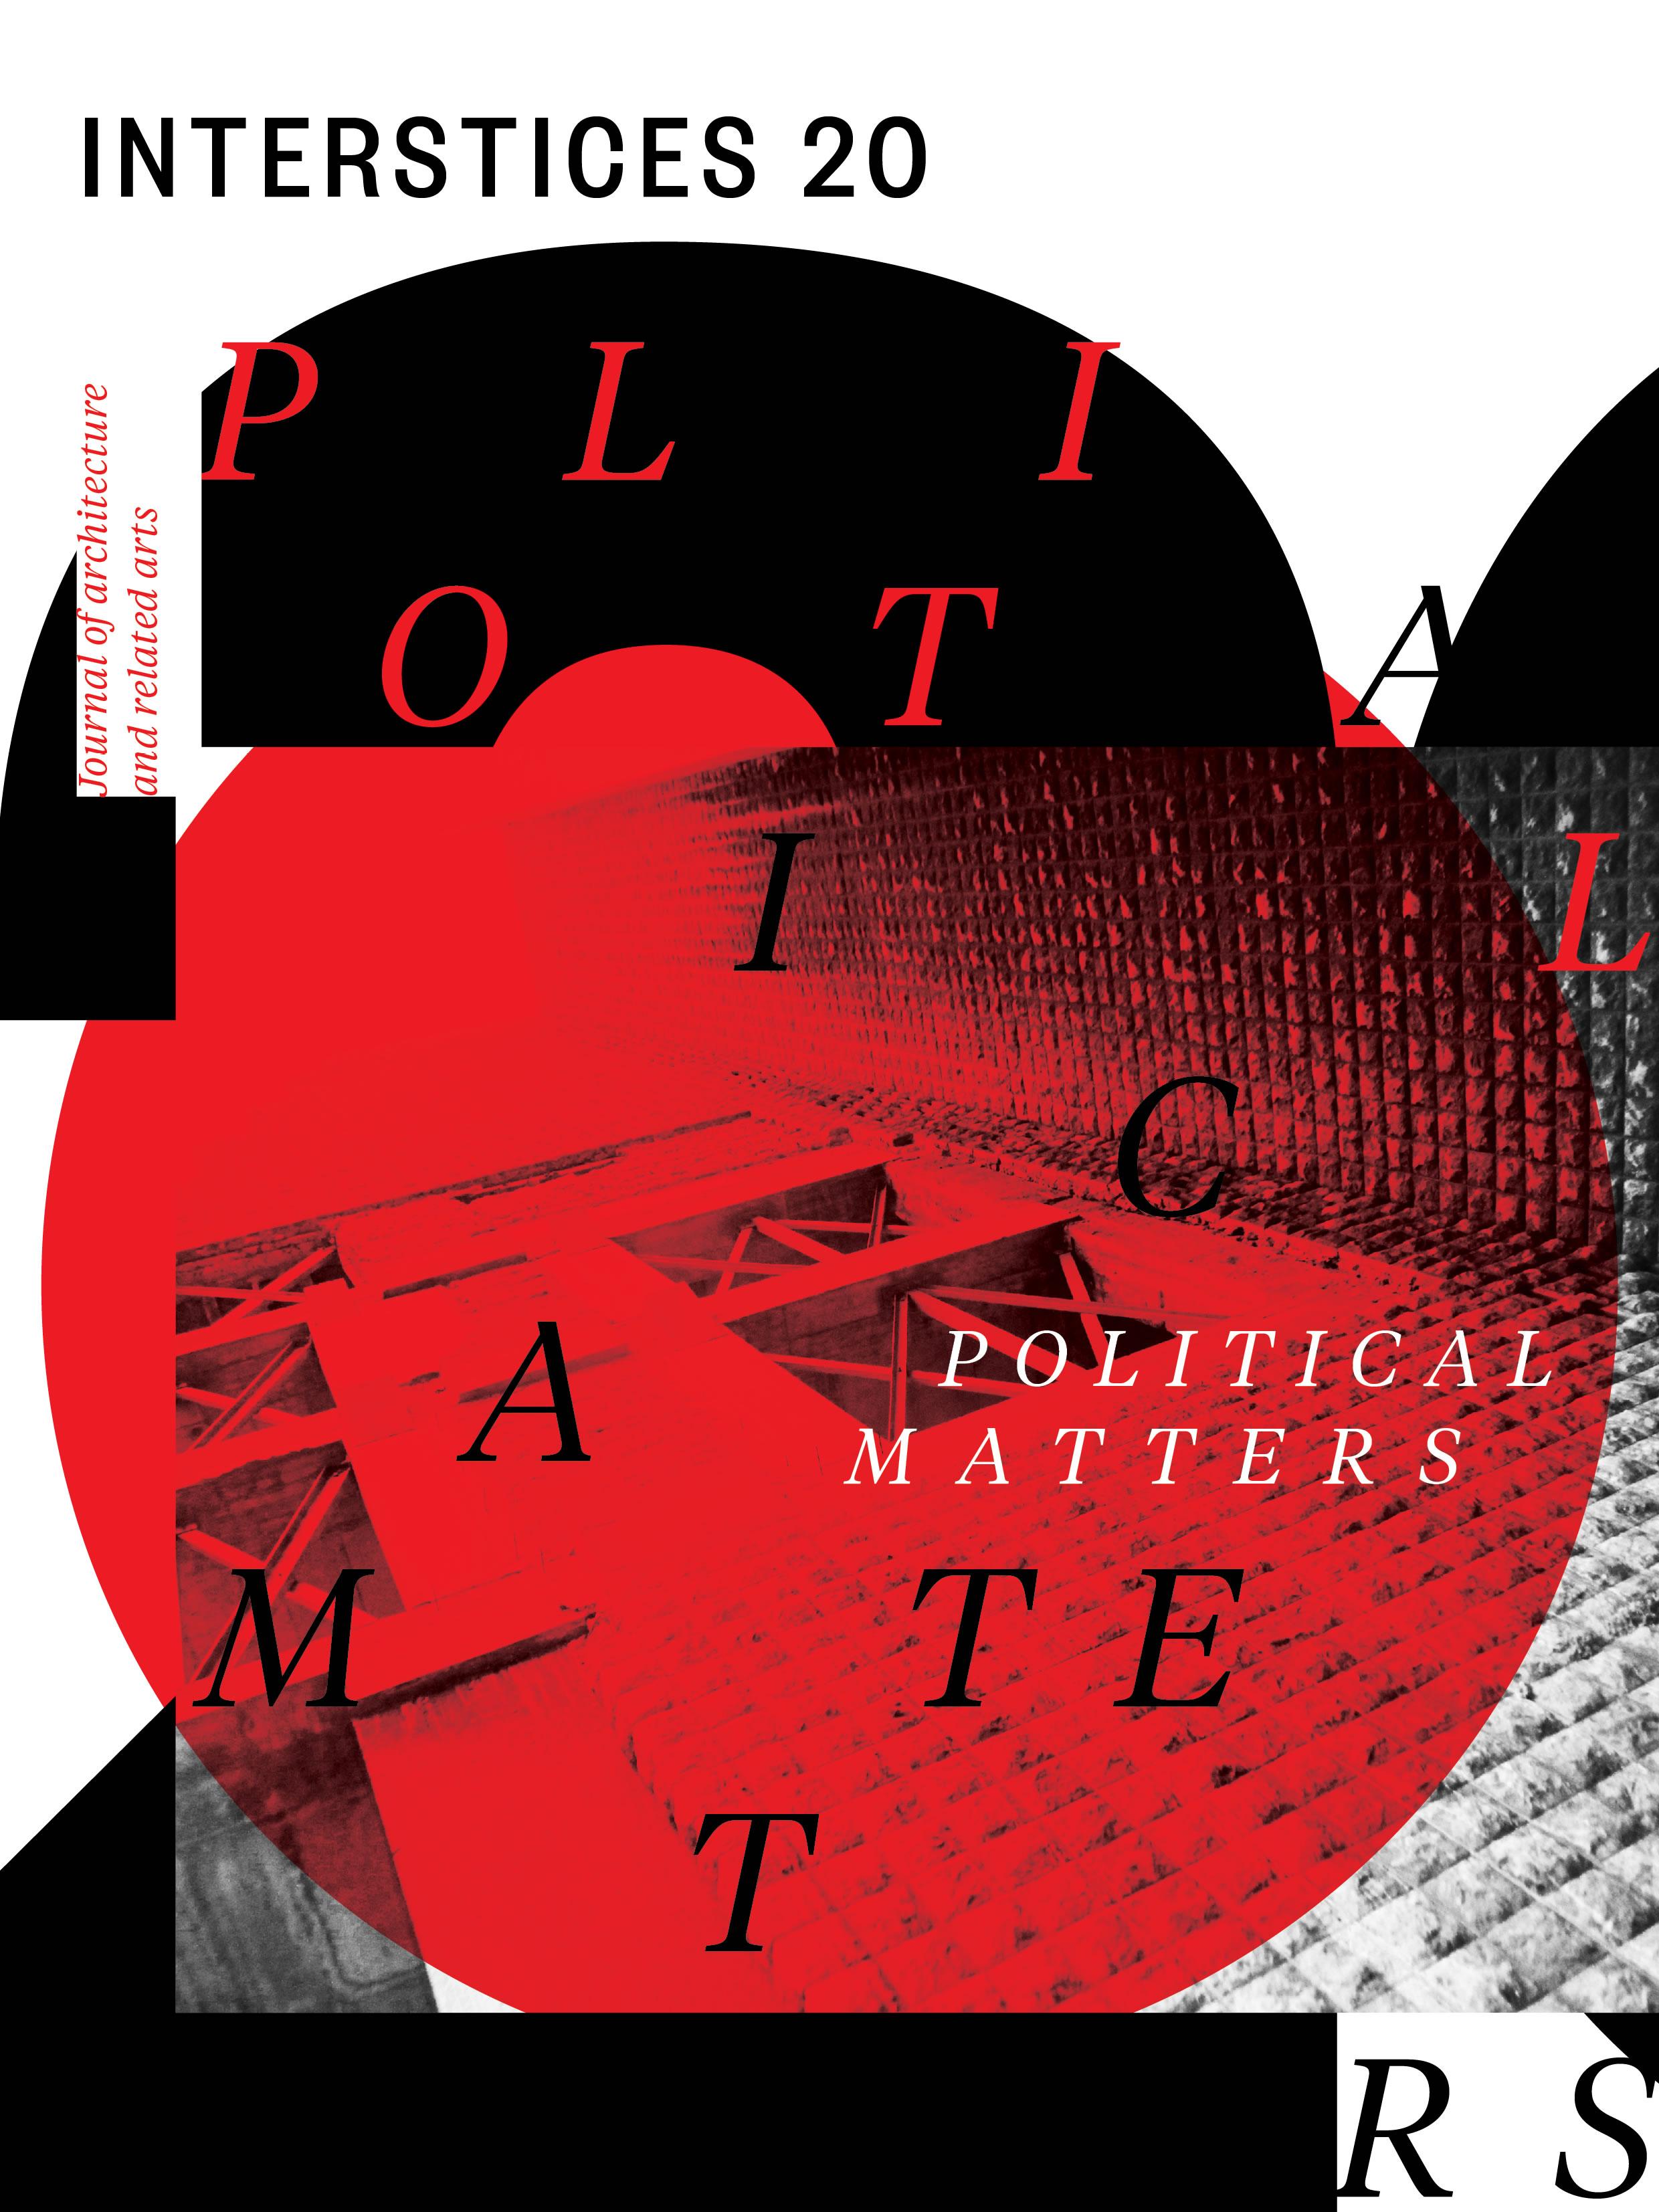 Interstices 20 cover